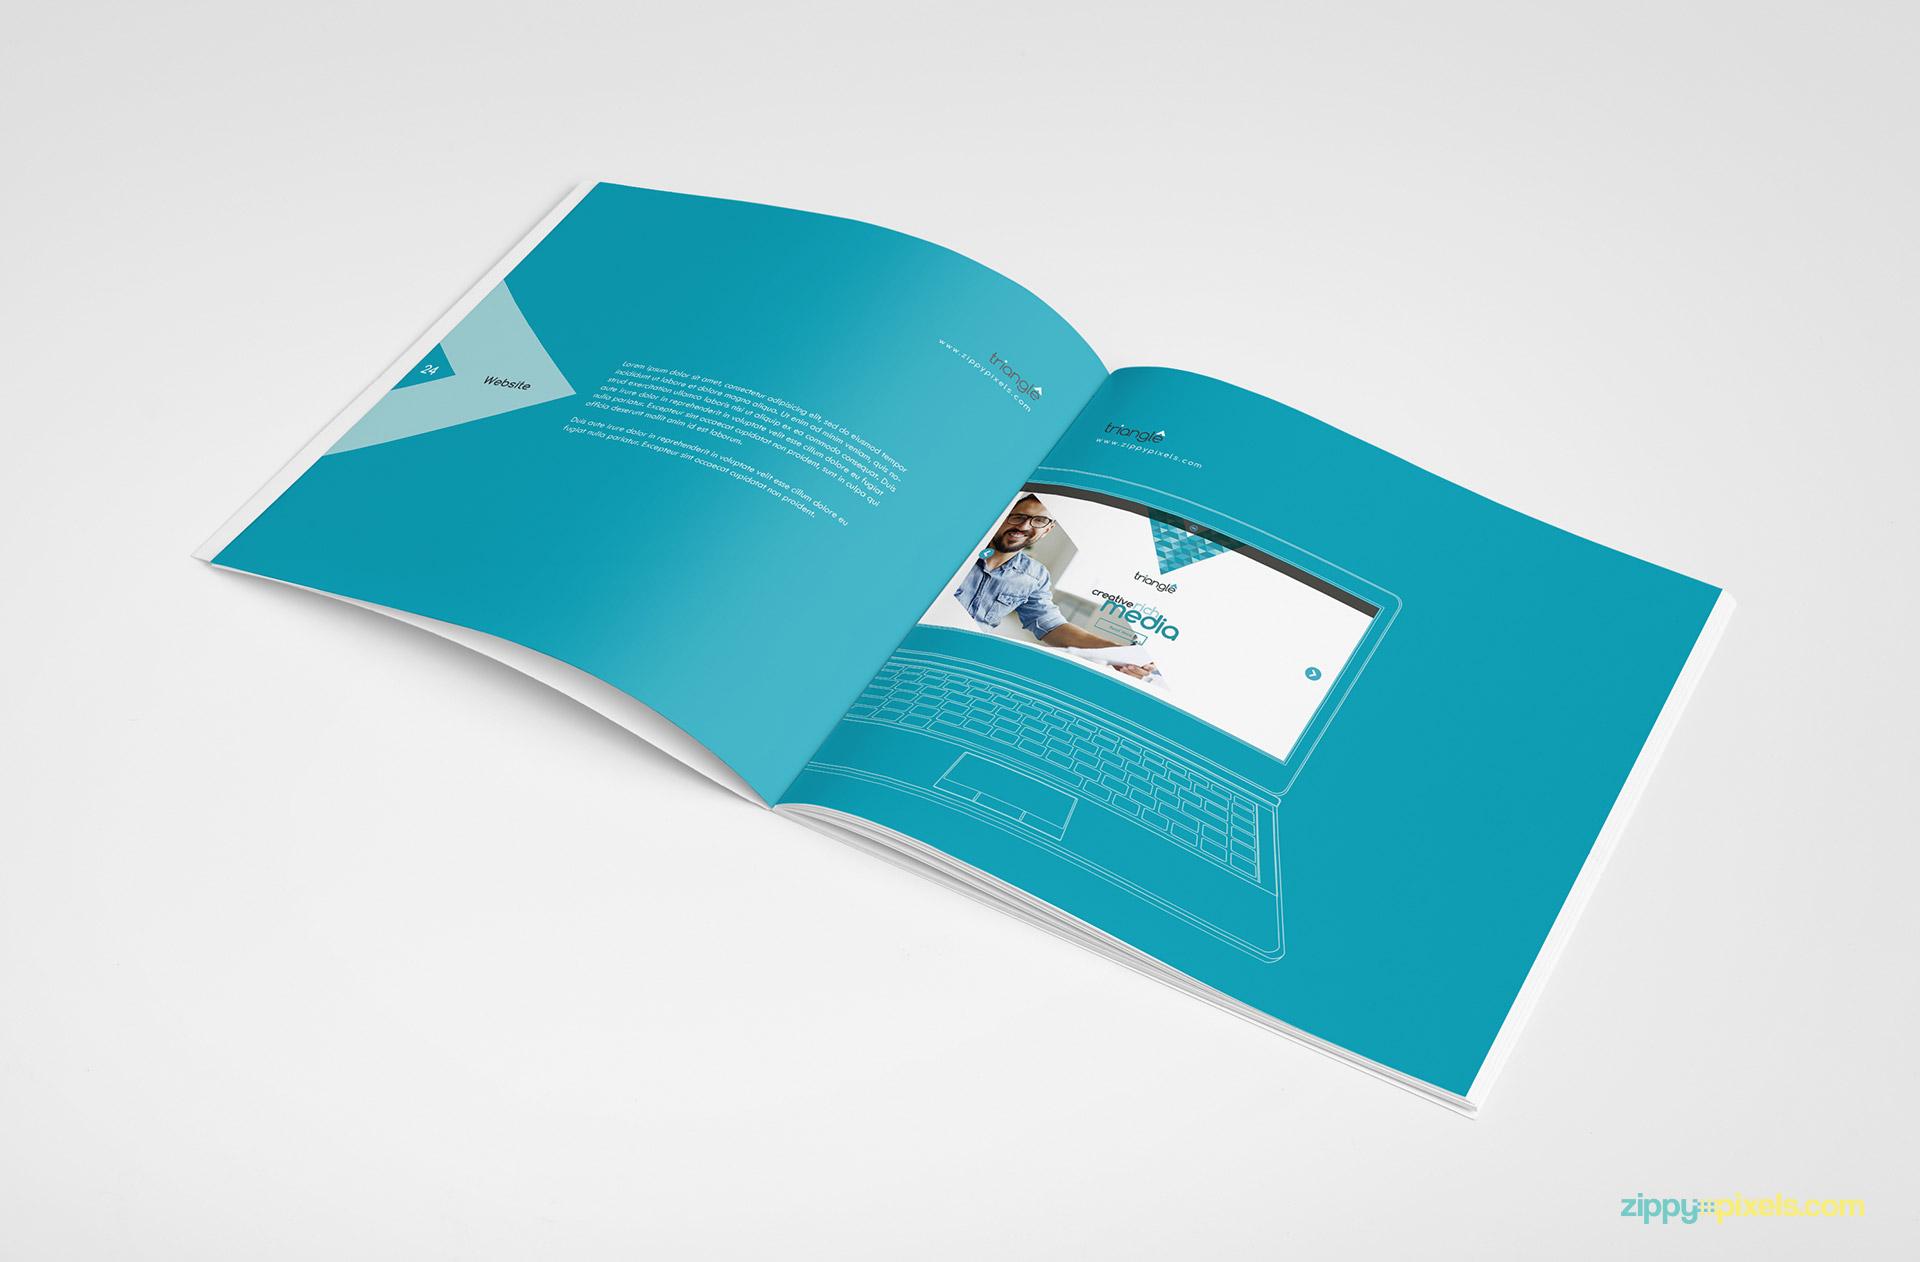 15-brand-book-11-website